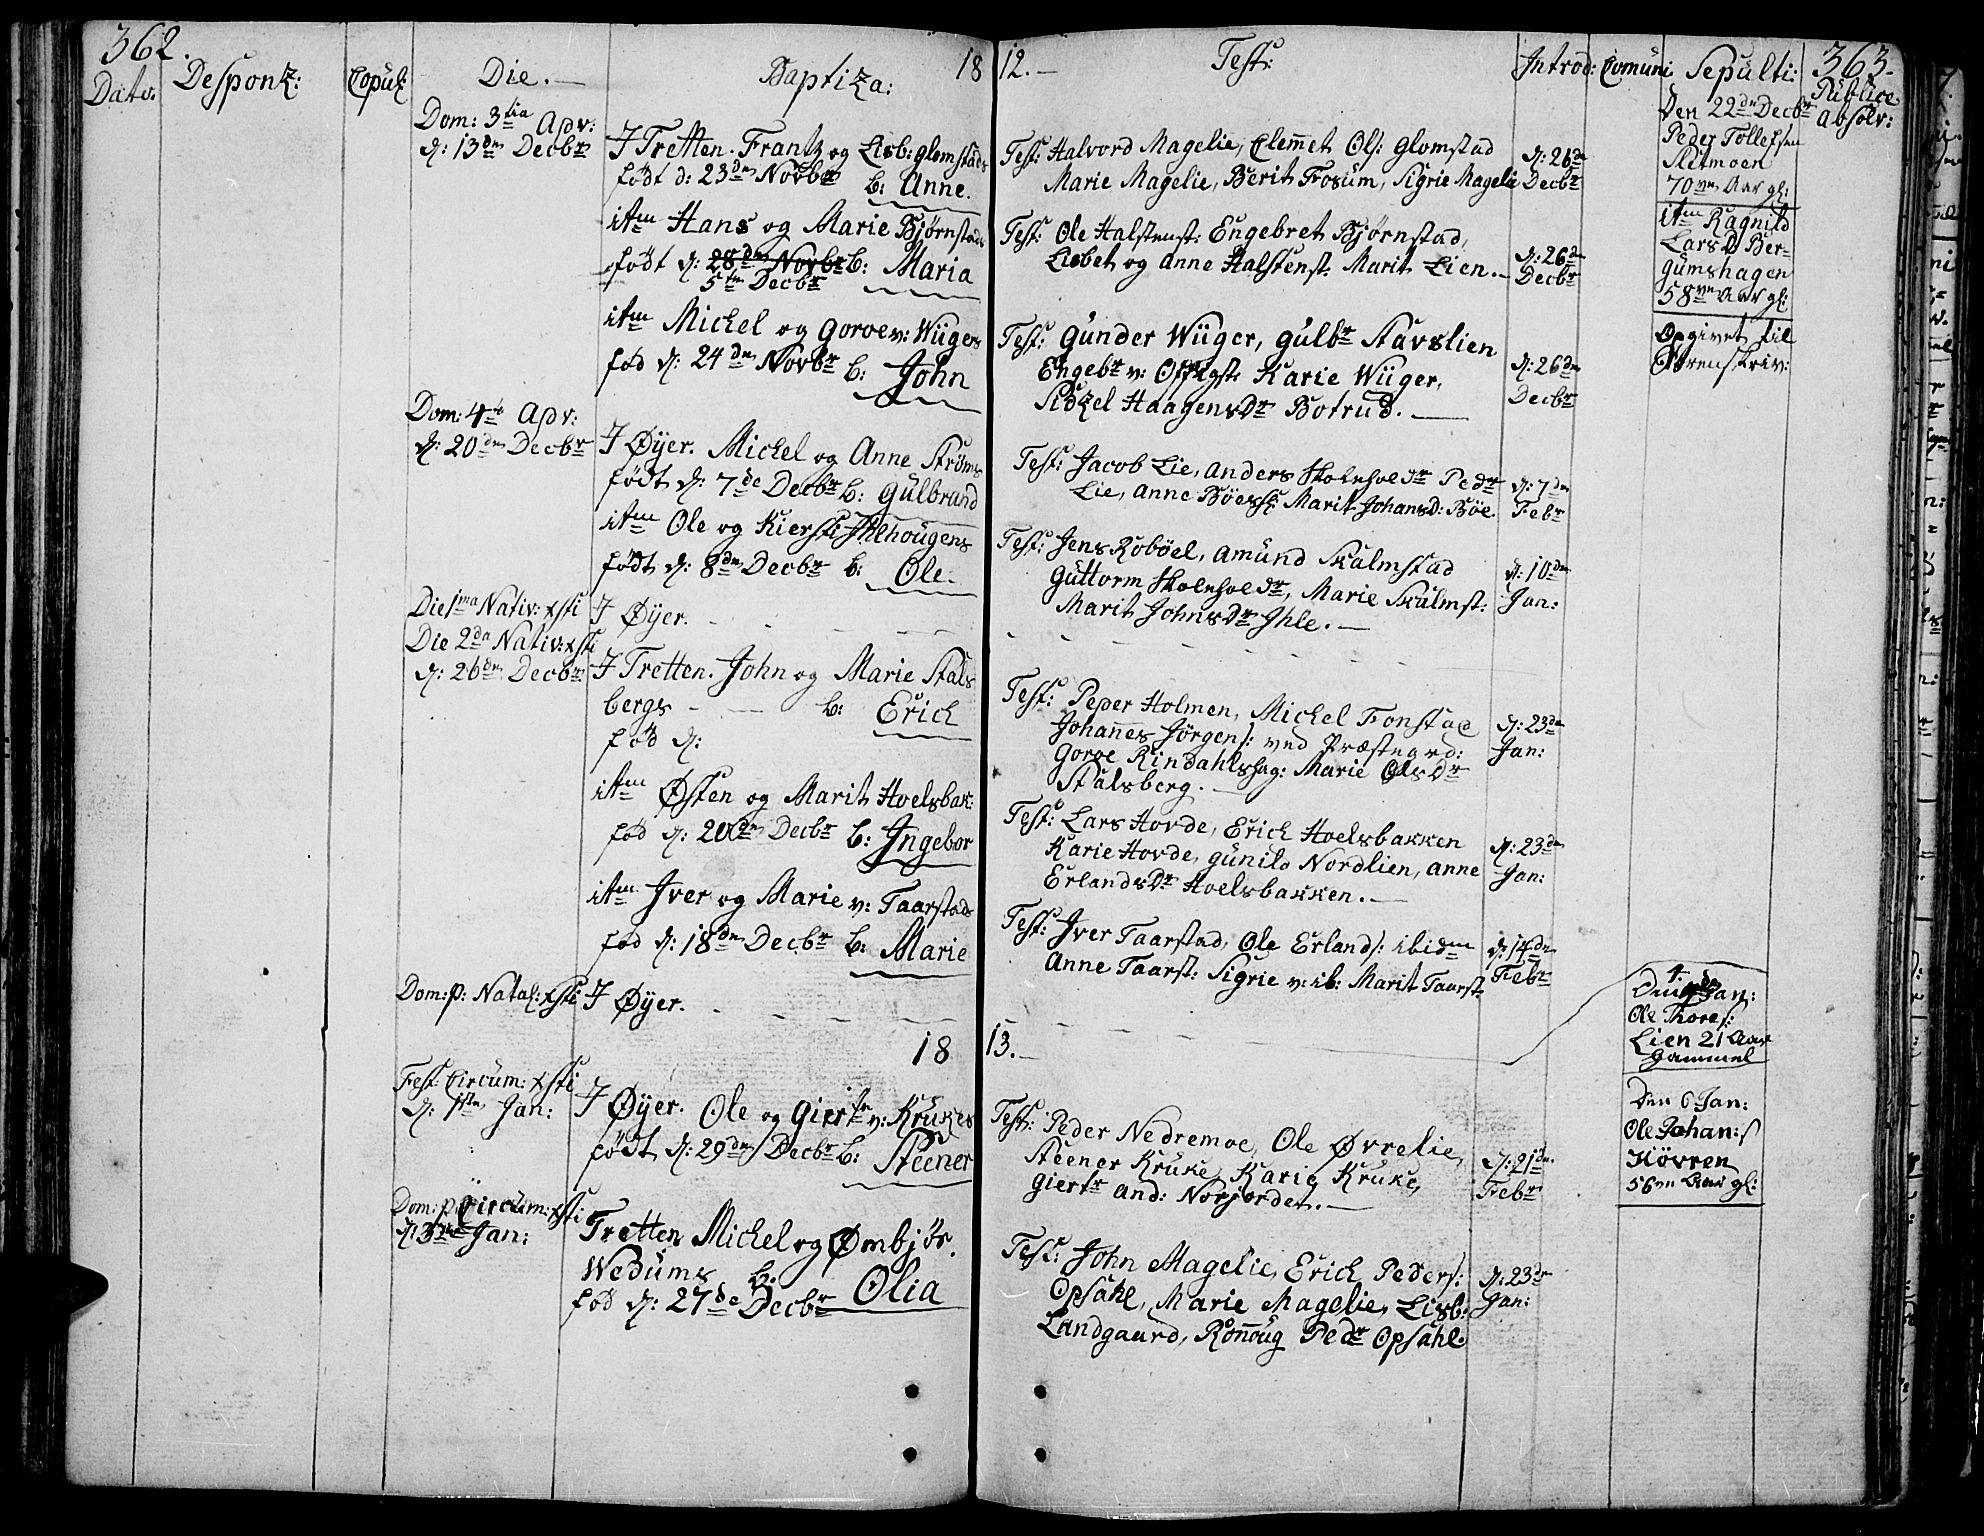 SAH, Øyer prestekontor, Ministerialbok nr. 3, 1784-1824, s. 362-363